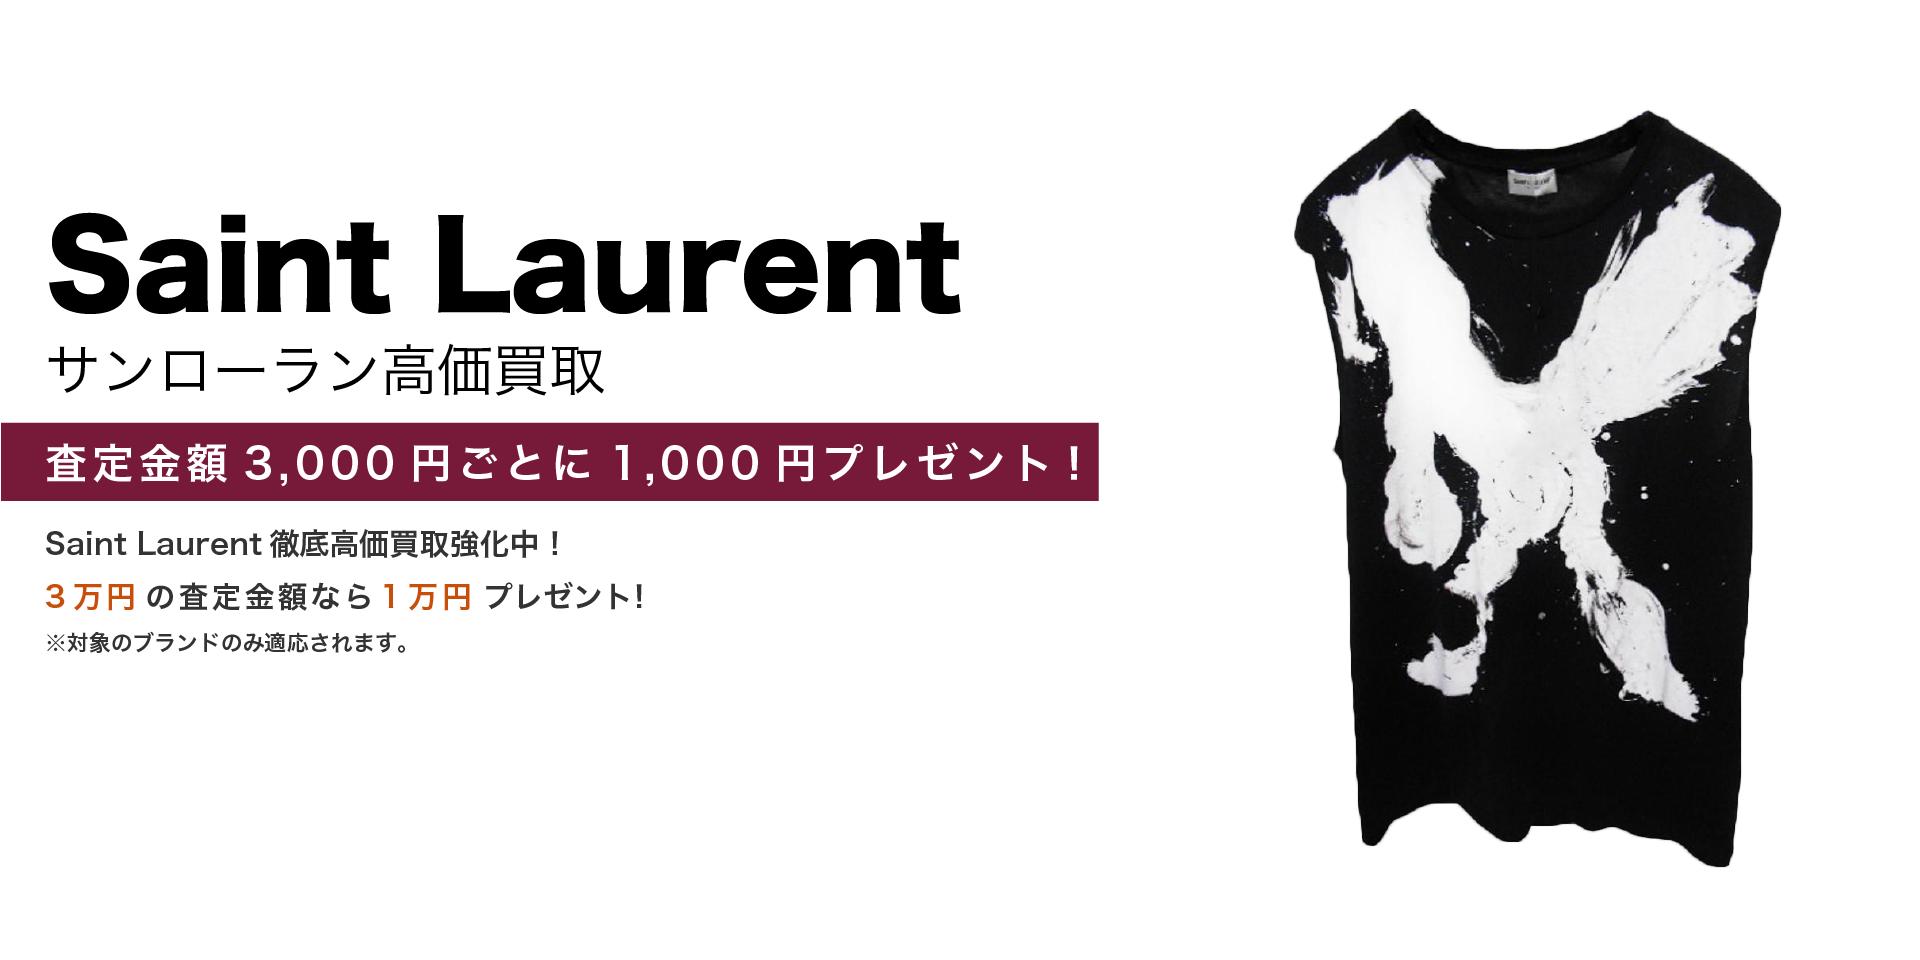 Saint Laurentのキービジュアル